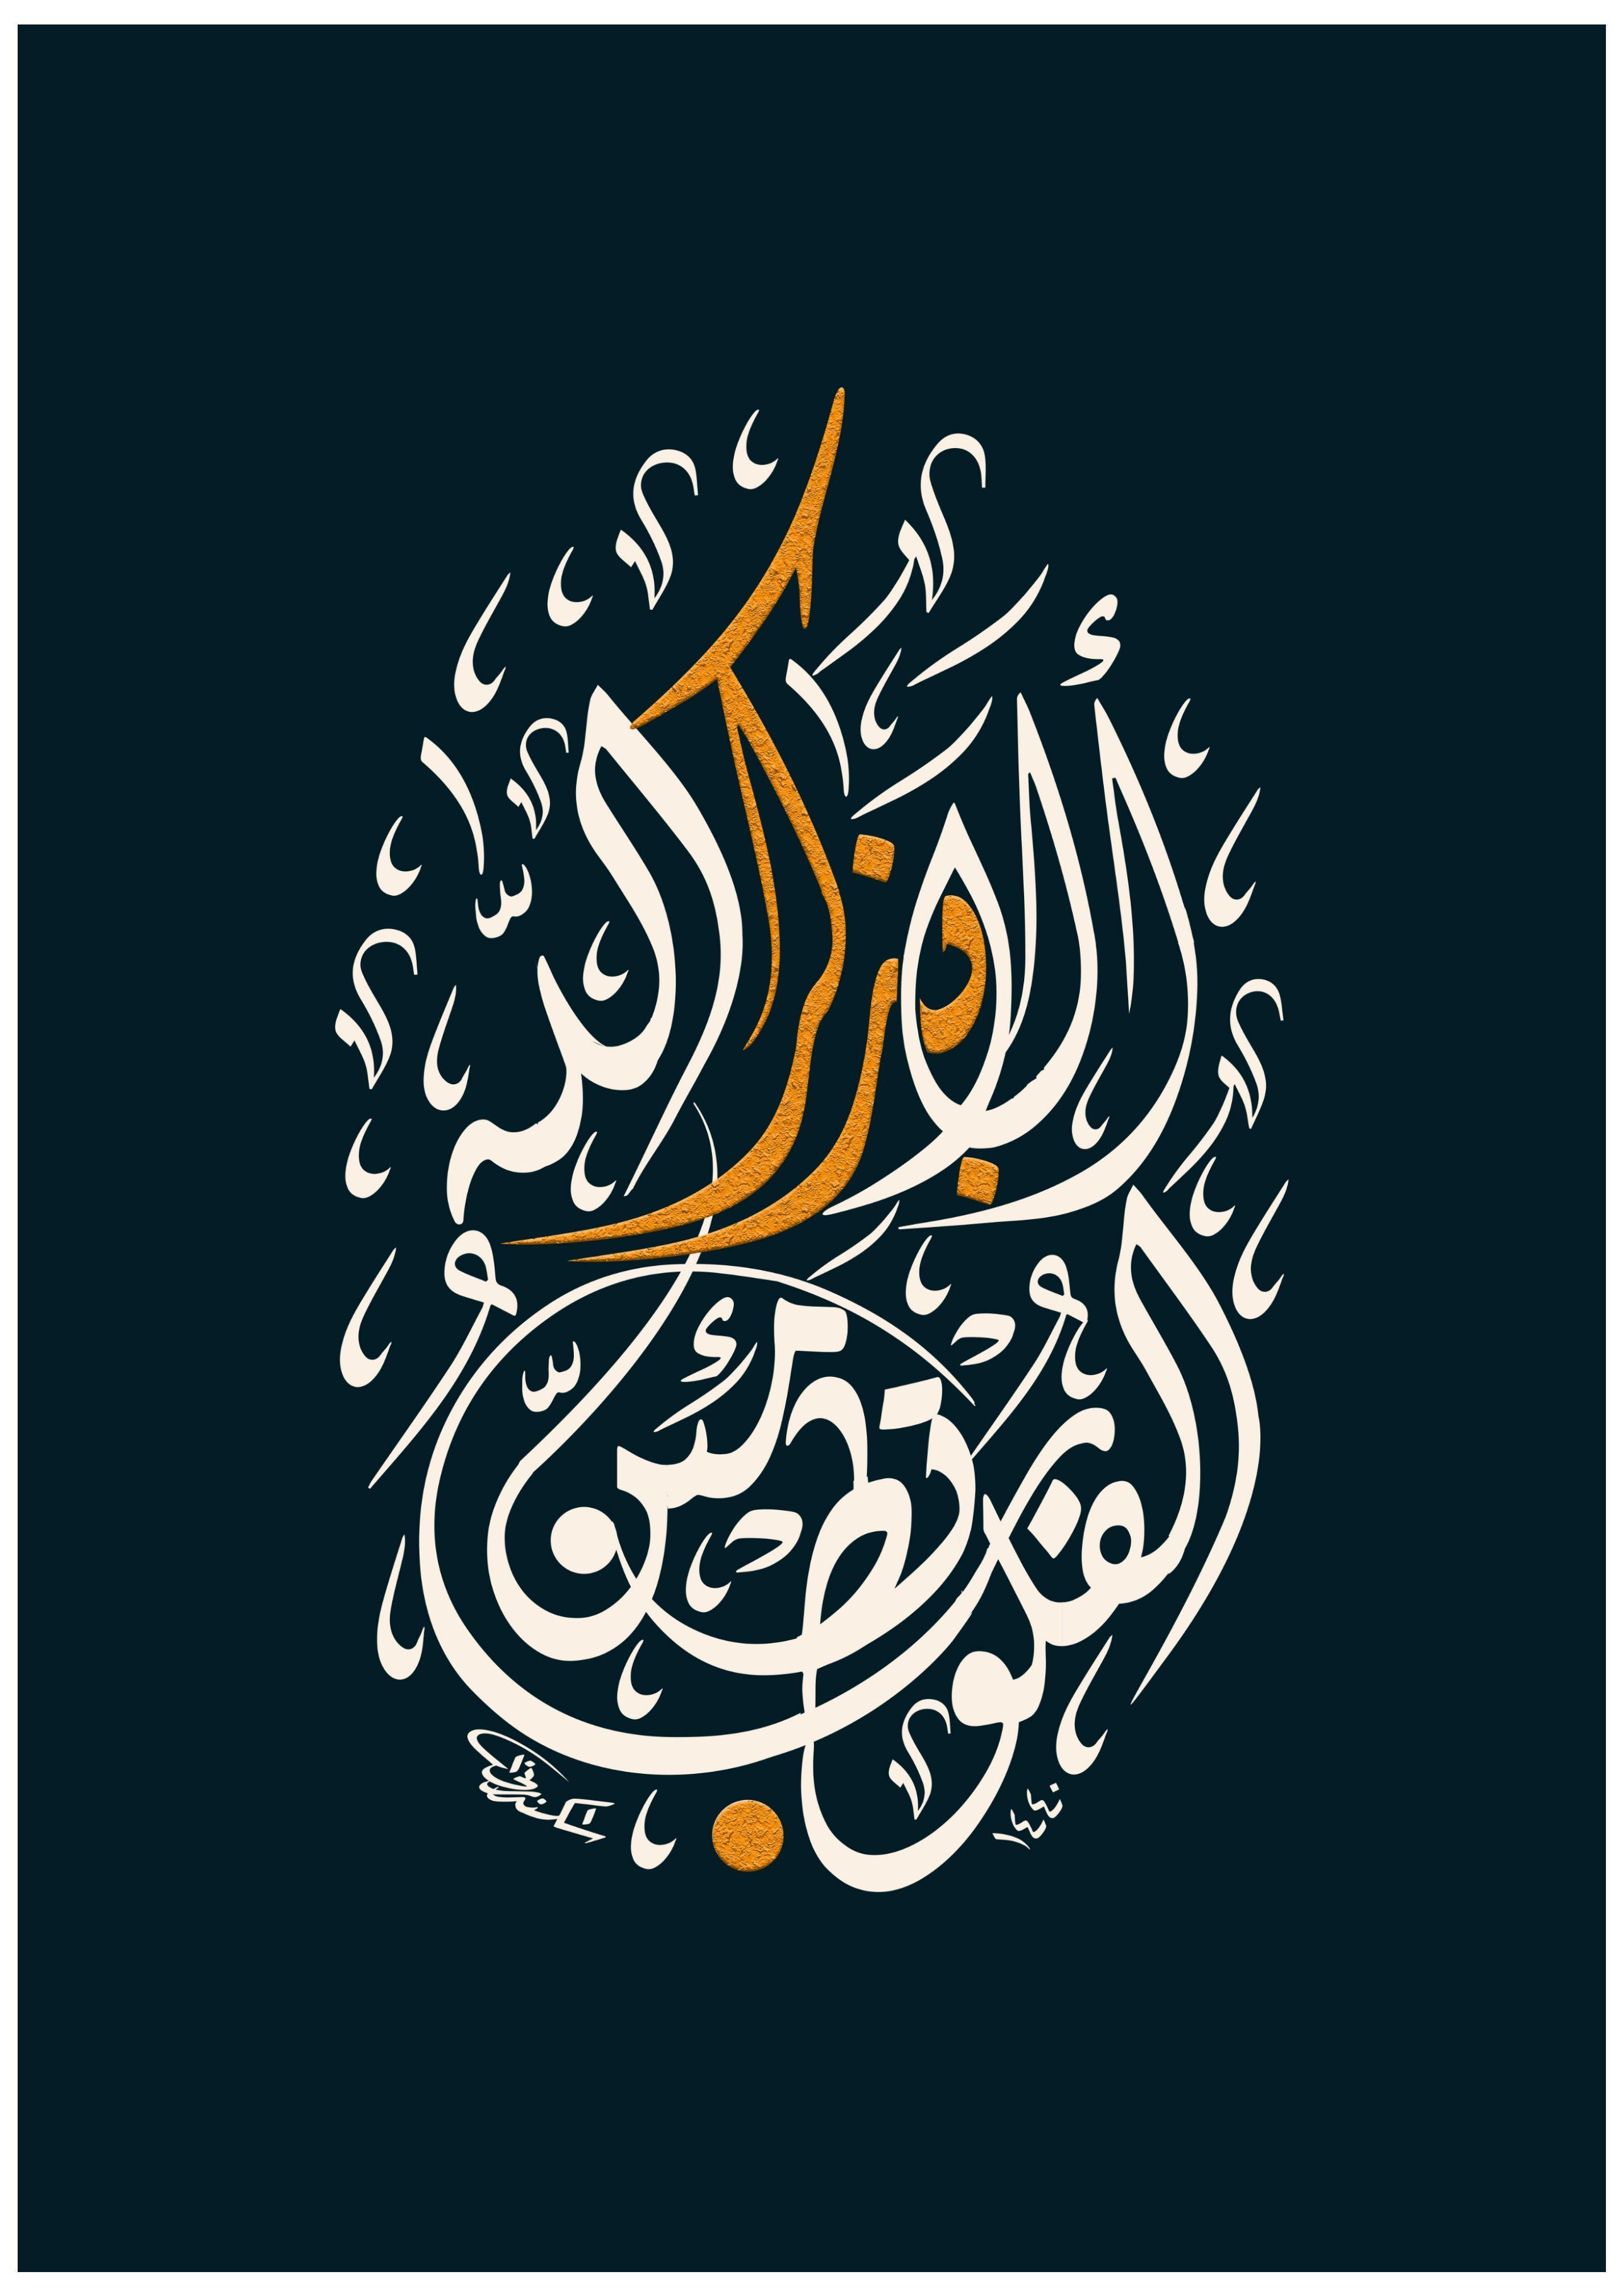 ال ذ ين آم ن وا و ت ط م ئ ن ق ل وب ه م ب ذ ك ر الل ه أ ل ا ب ذ ك ر الل ه ت ط م Islamic Art Calligraphy Islamic Calligraphy Arabic Calligraphy Art